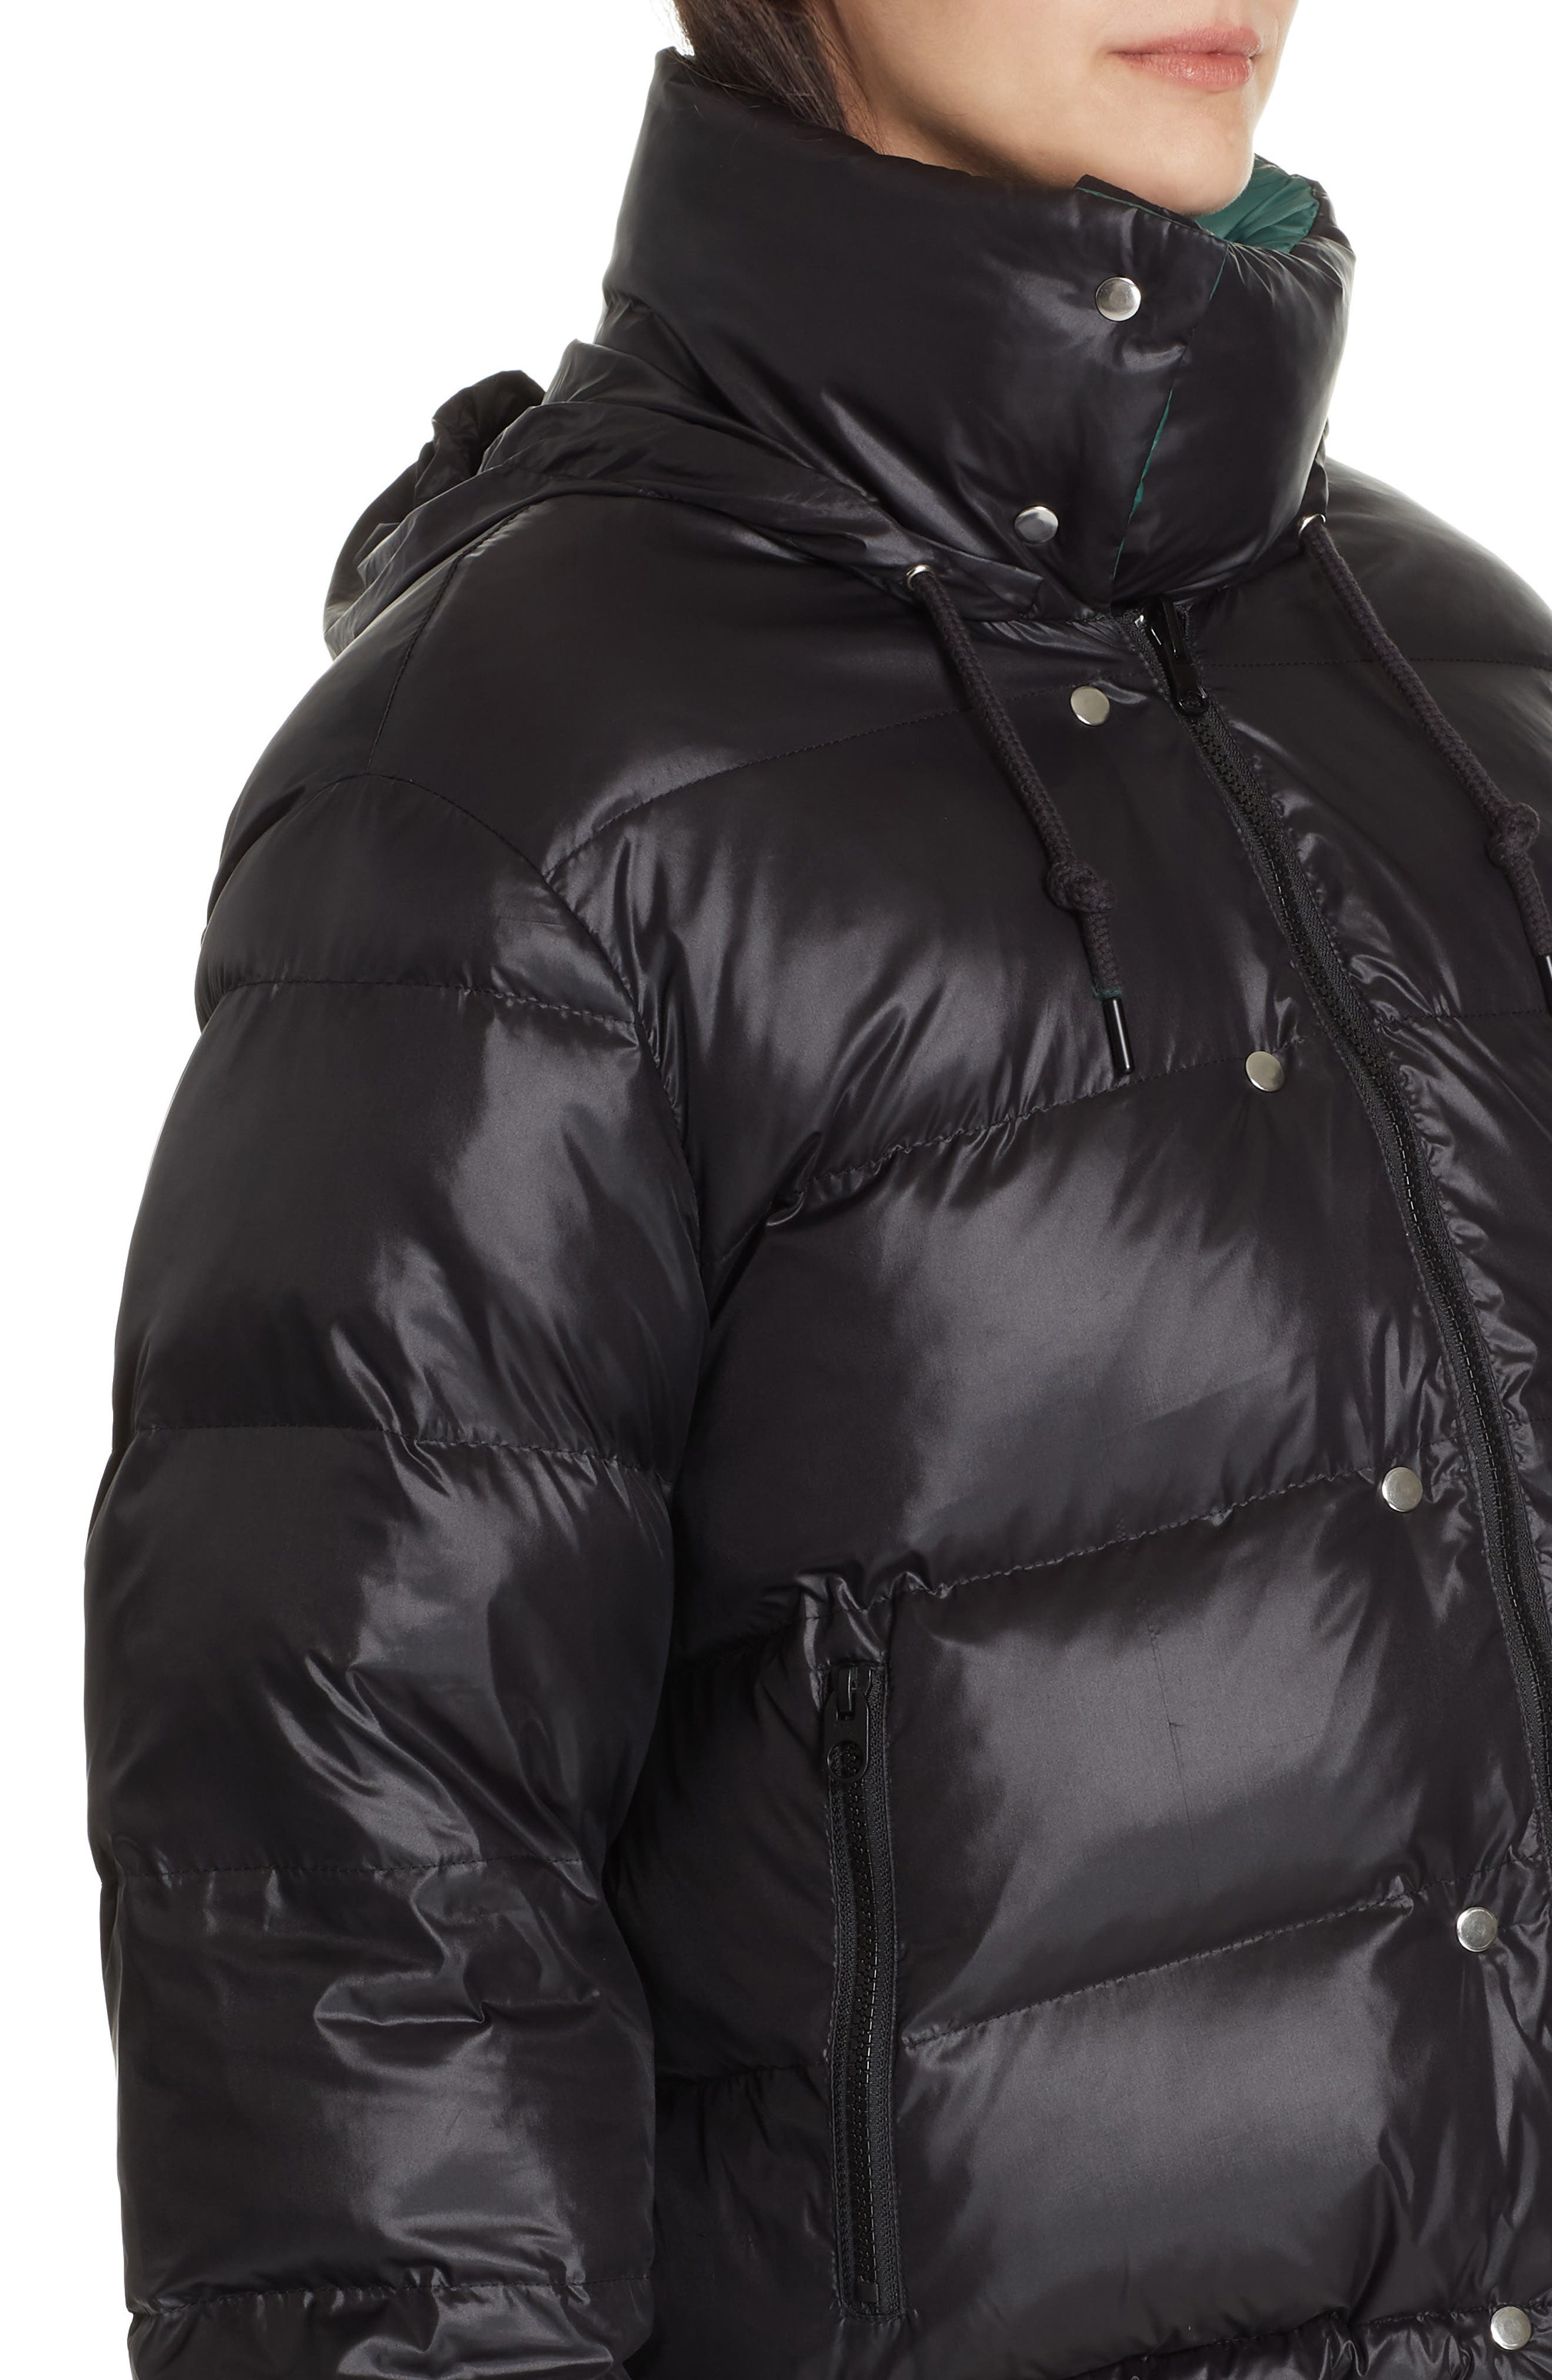 PROENZA SCHOULER, PSWL Reversible Puffer Coat, Alternate thumbnail 2, color, GREEN/ BLACK